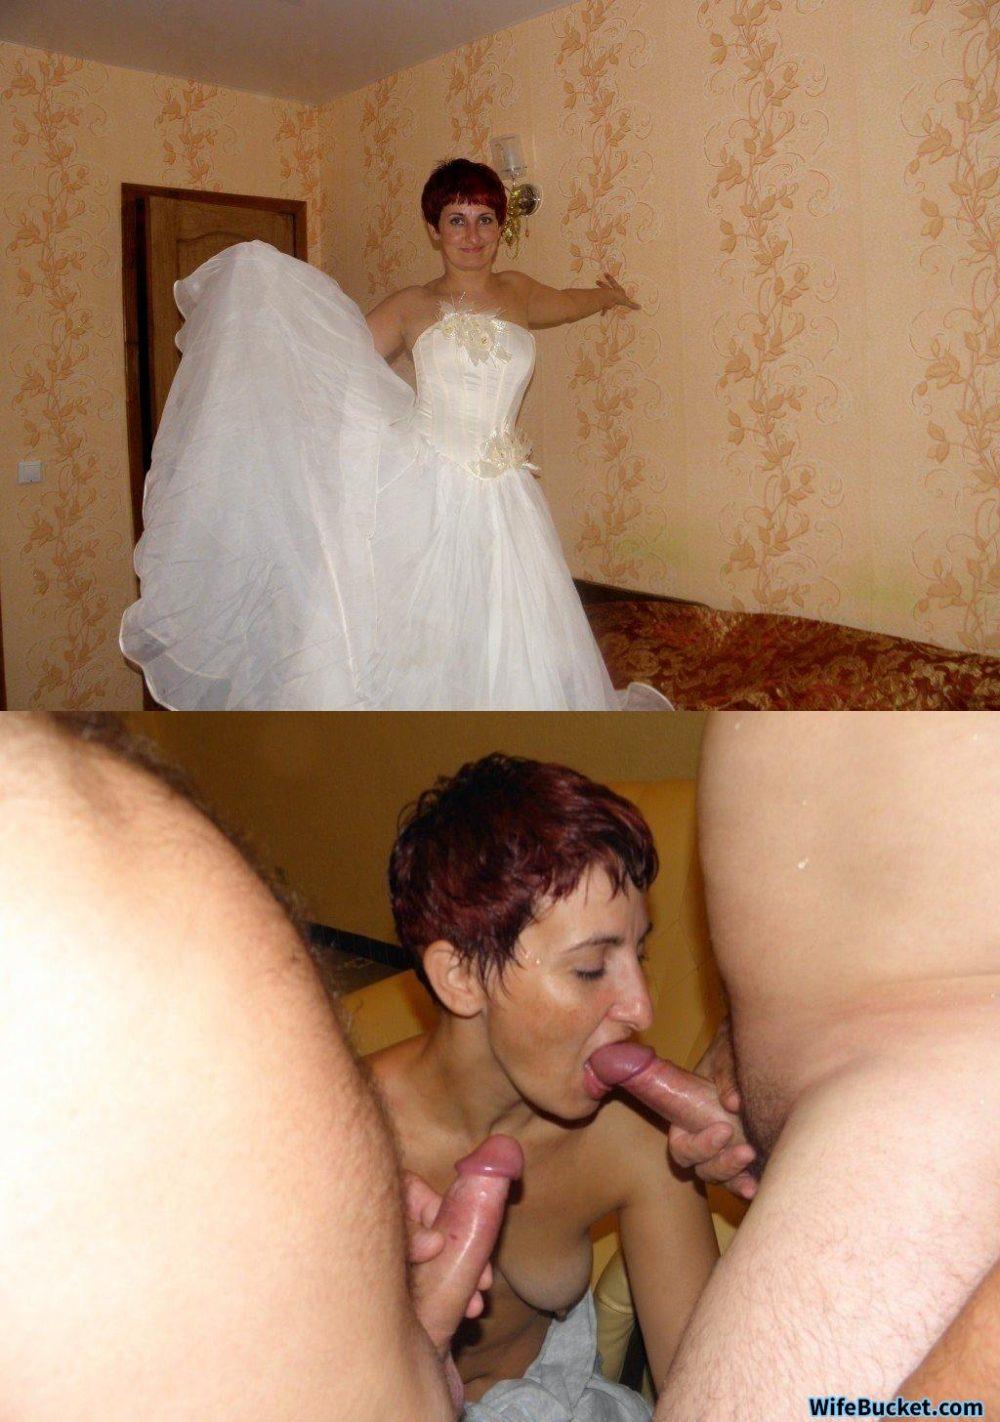 Honeymoon sex video